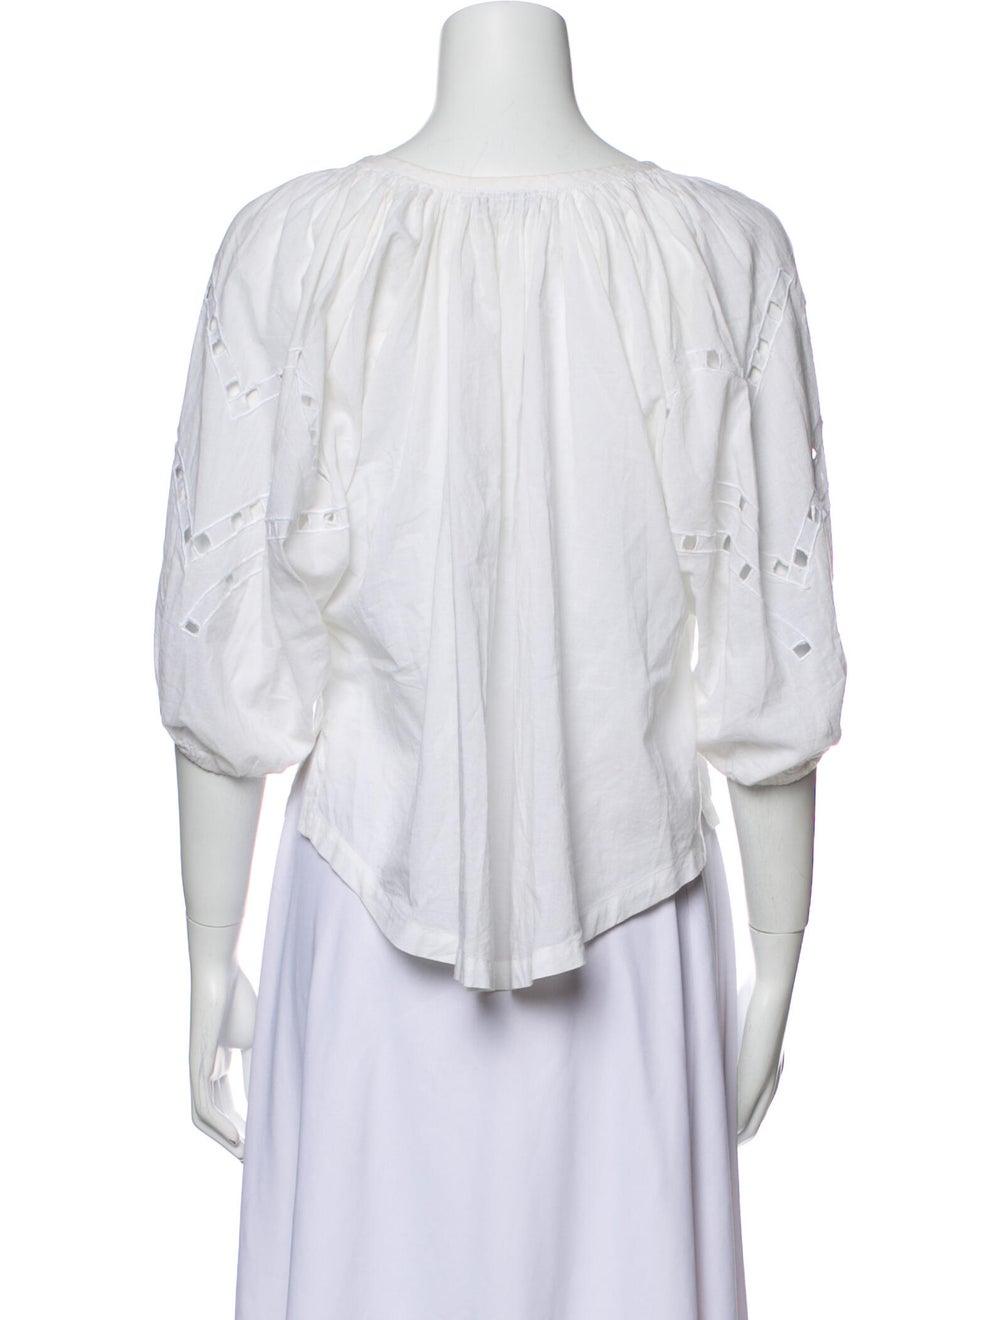 Iro Lace Pattern Scoop Neck Blouse White - image 3